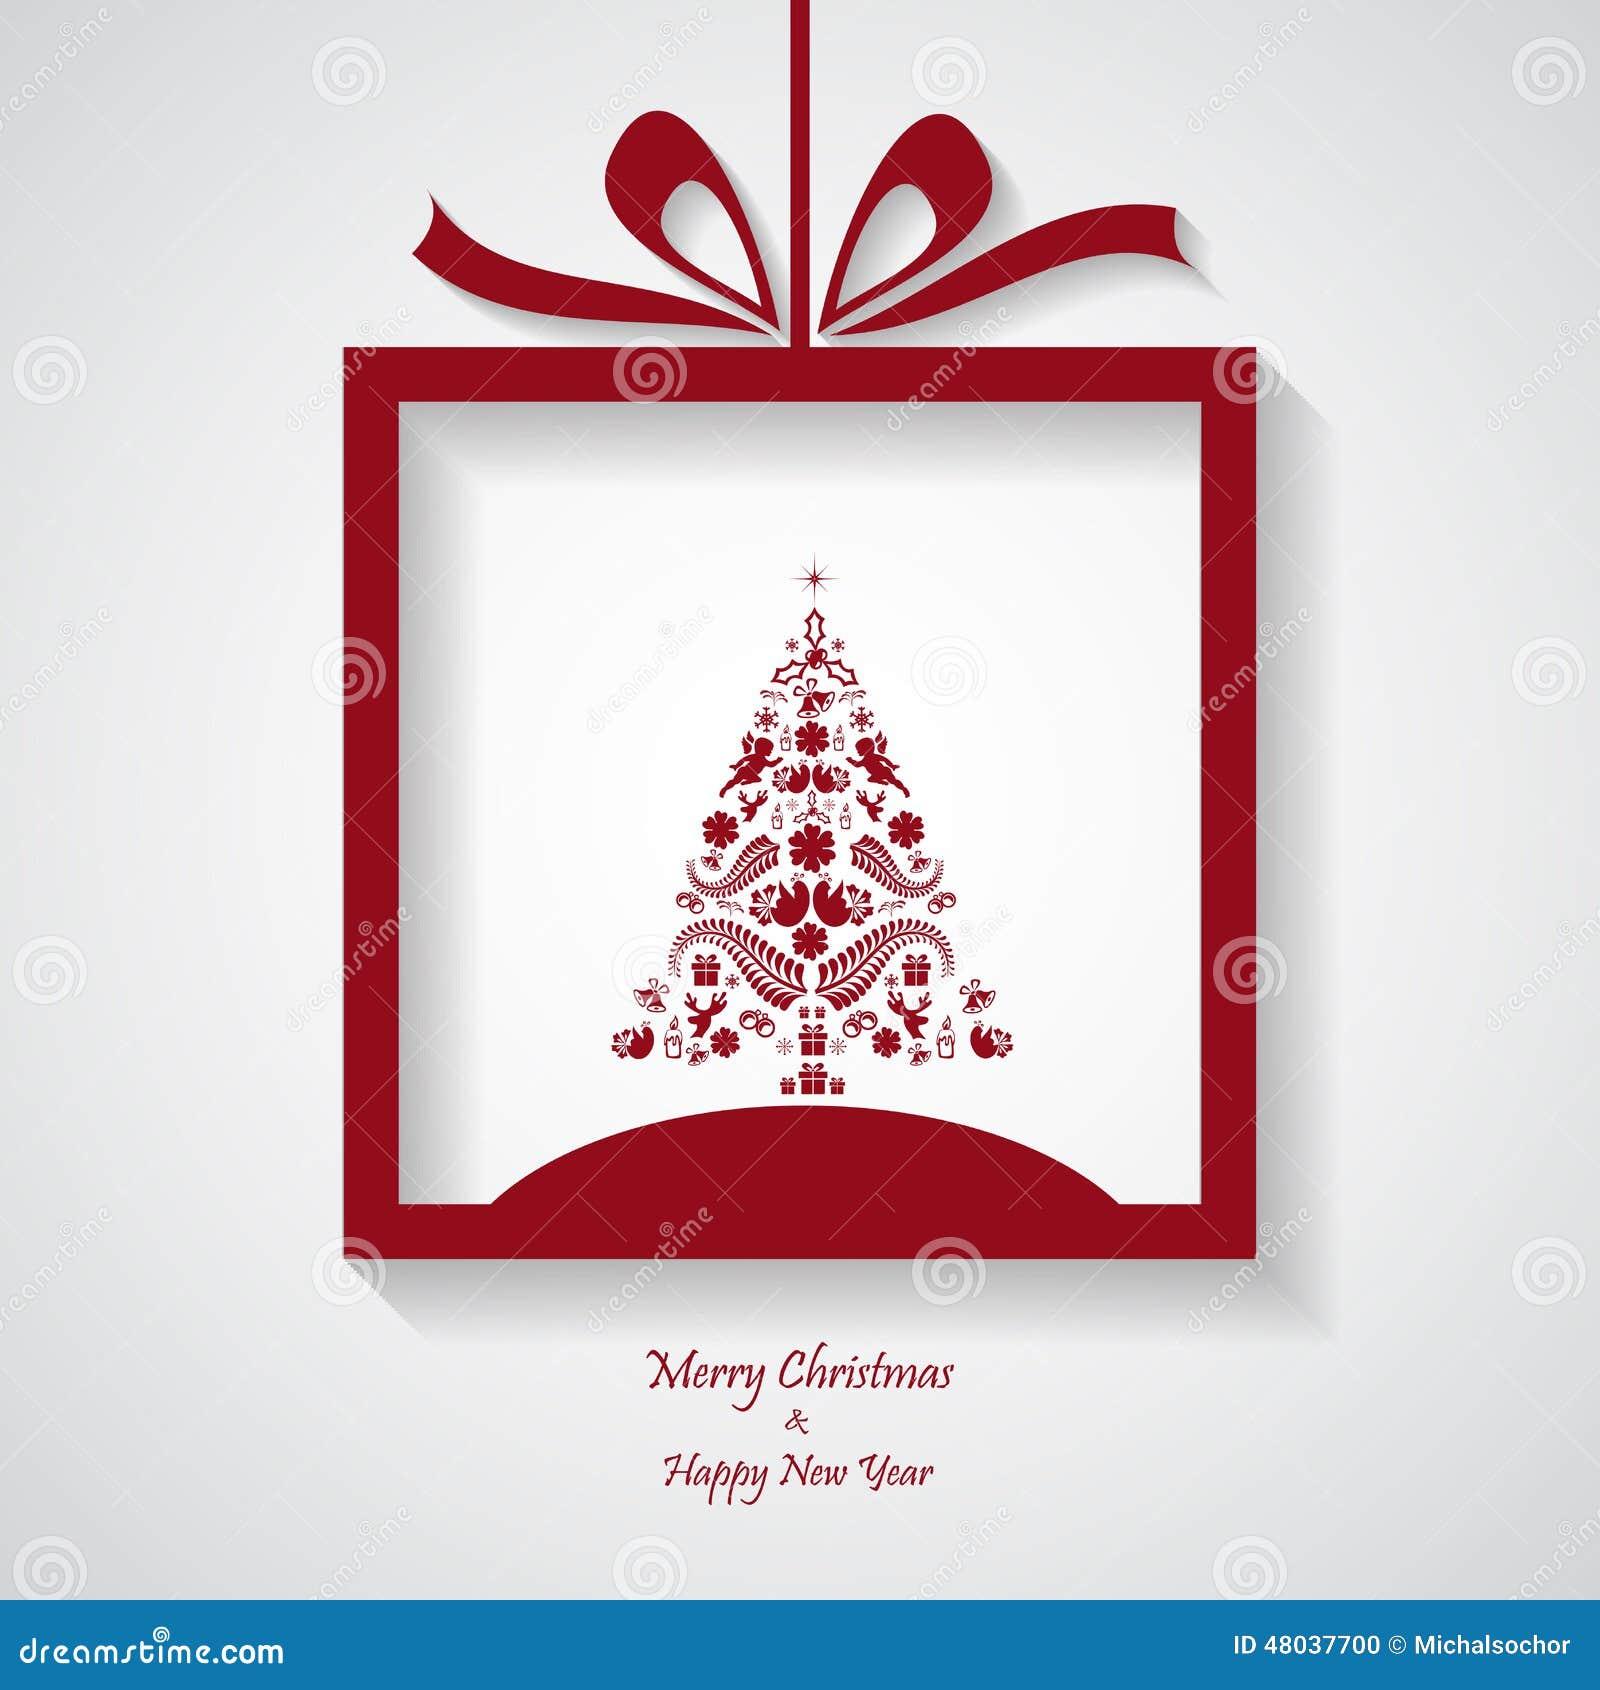 Merry Christmas Card Stock Illustration Illustration Of Greeting